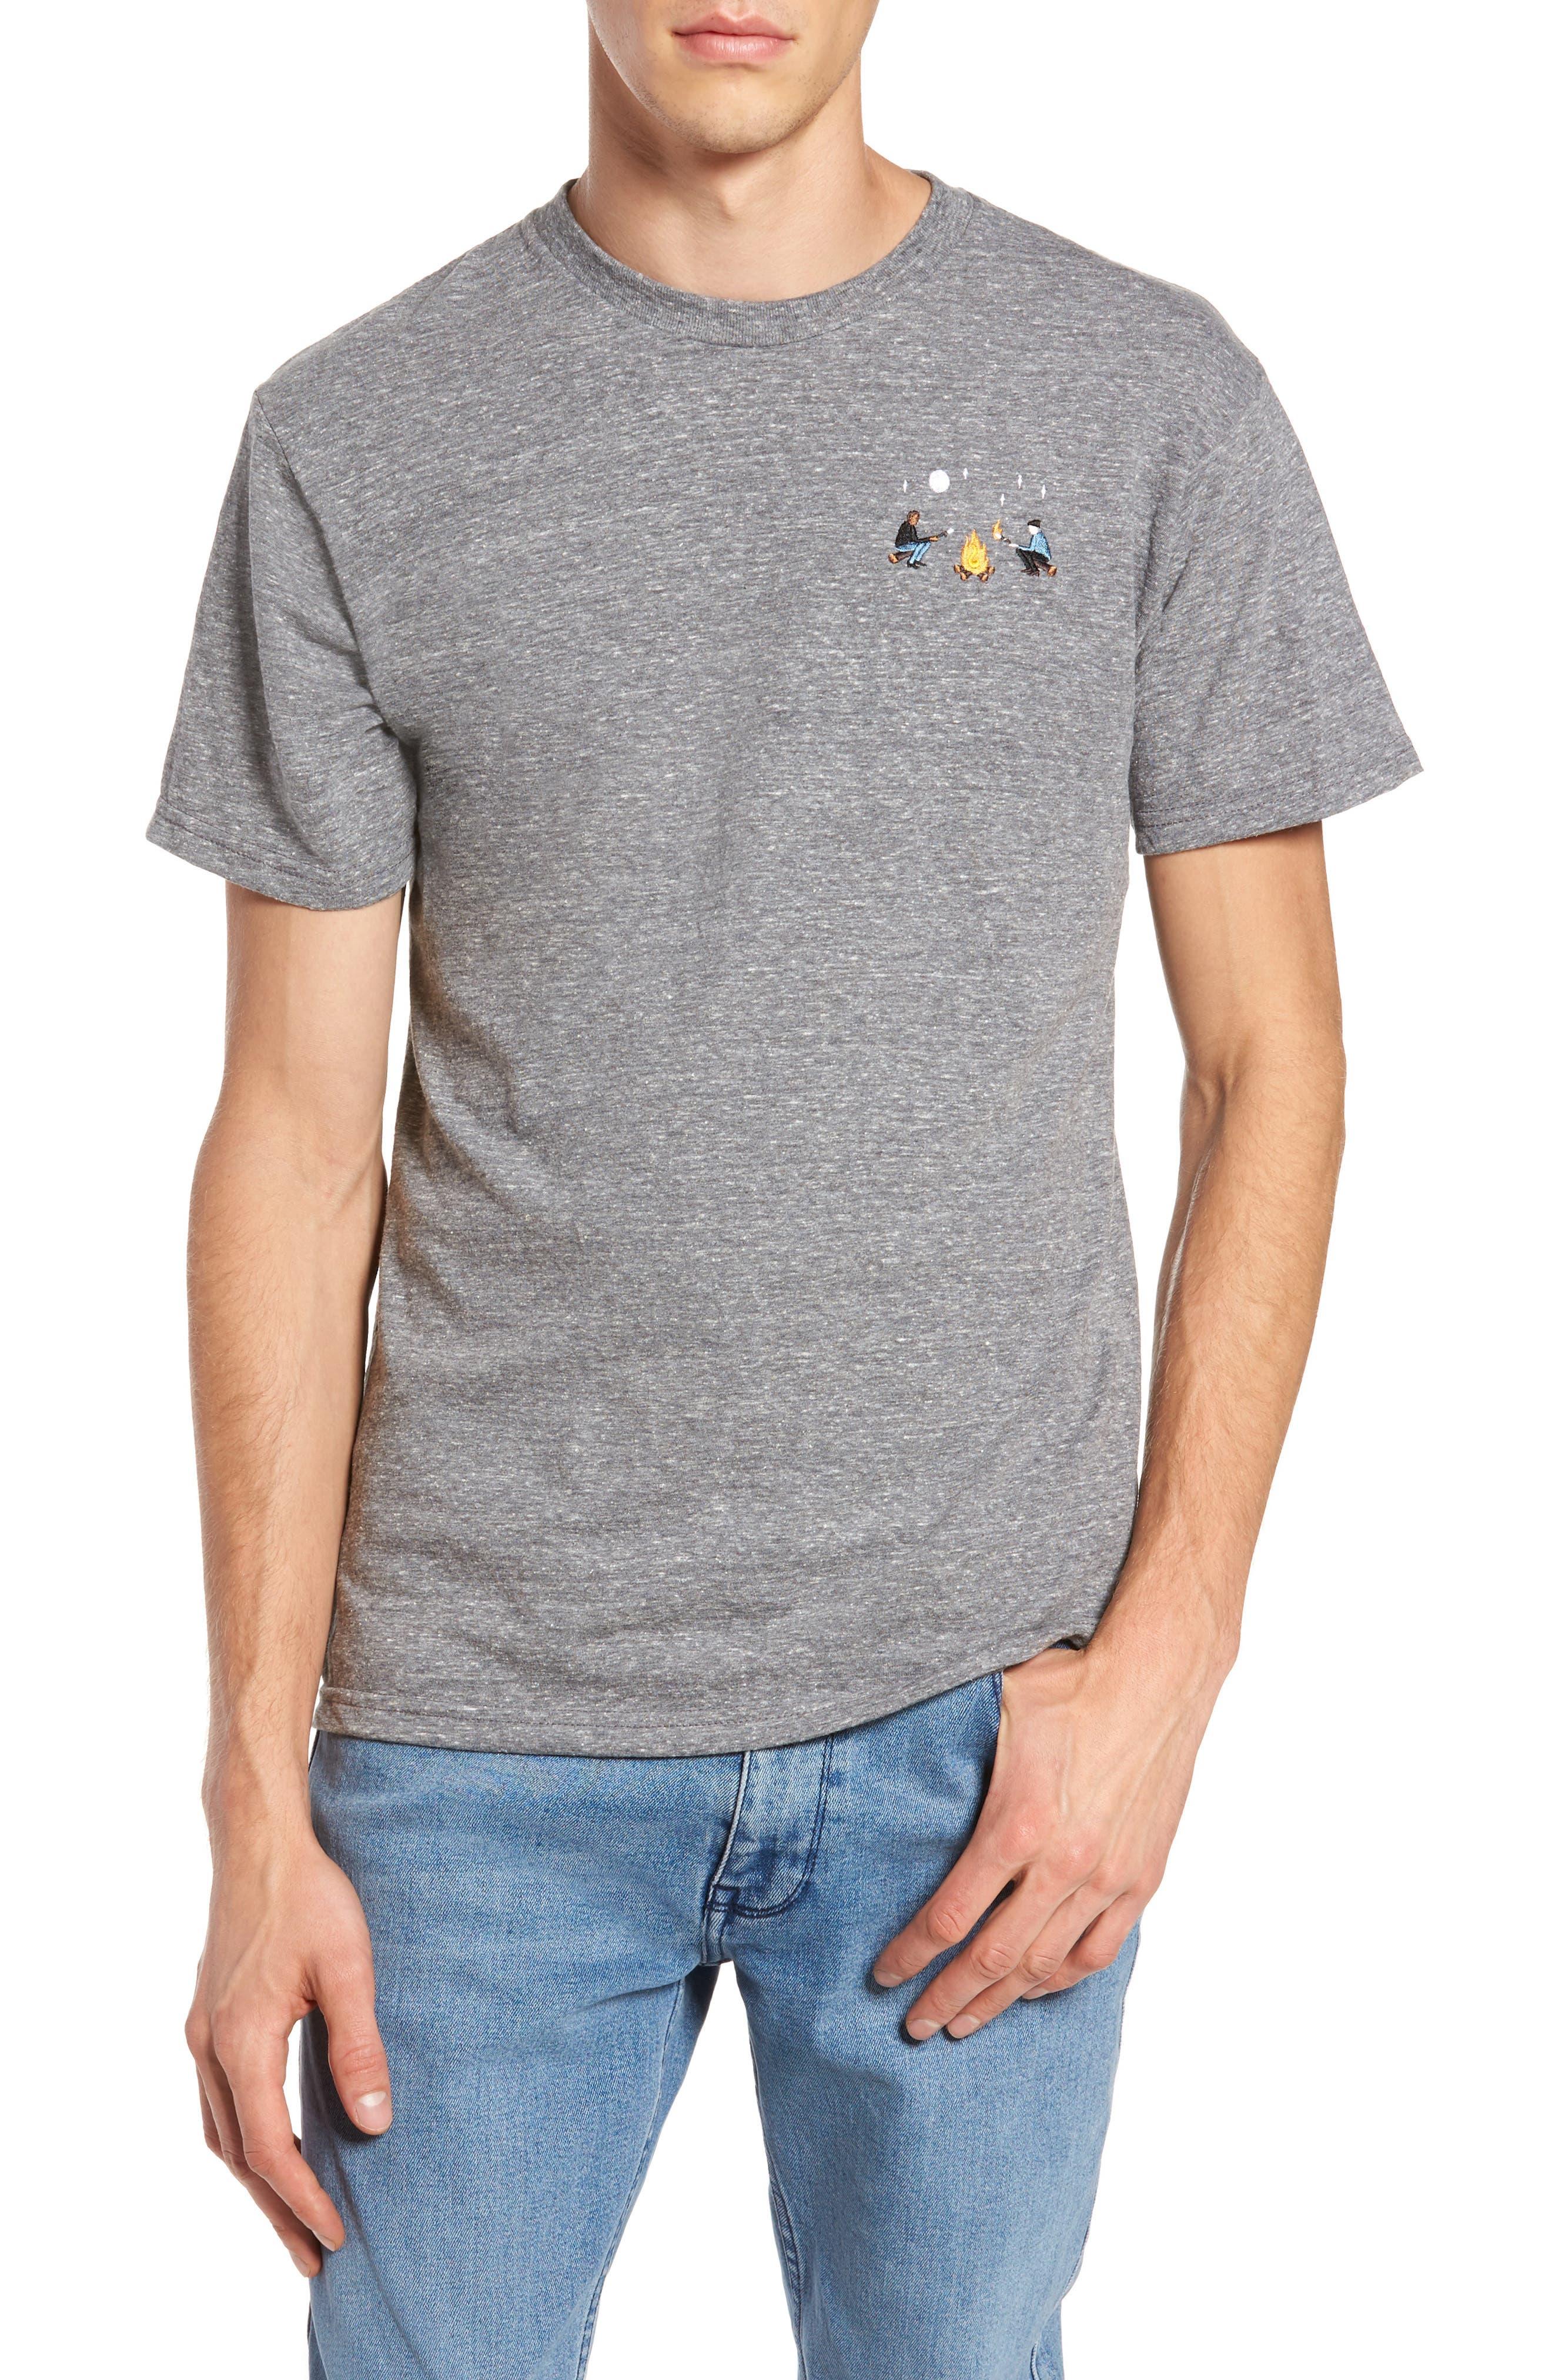 ALTRU Burning Marshmallows T-Shirt in Triblend Grey